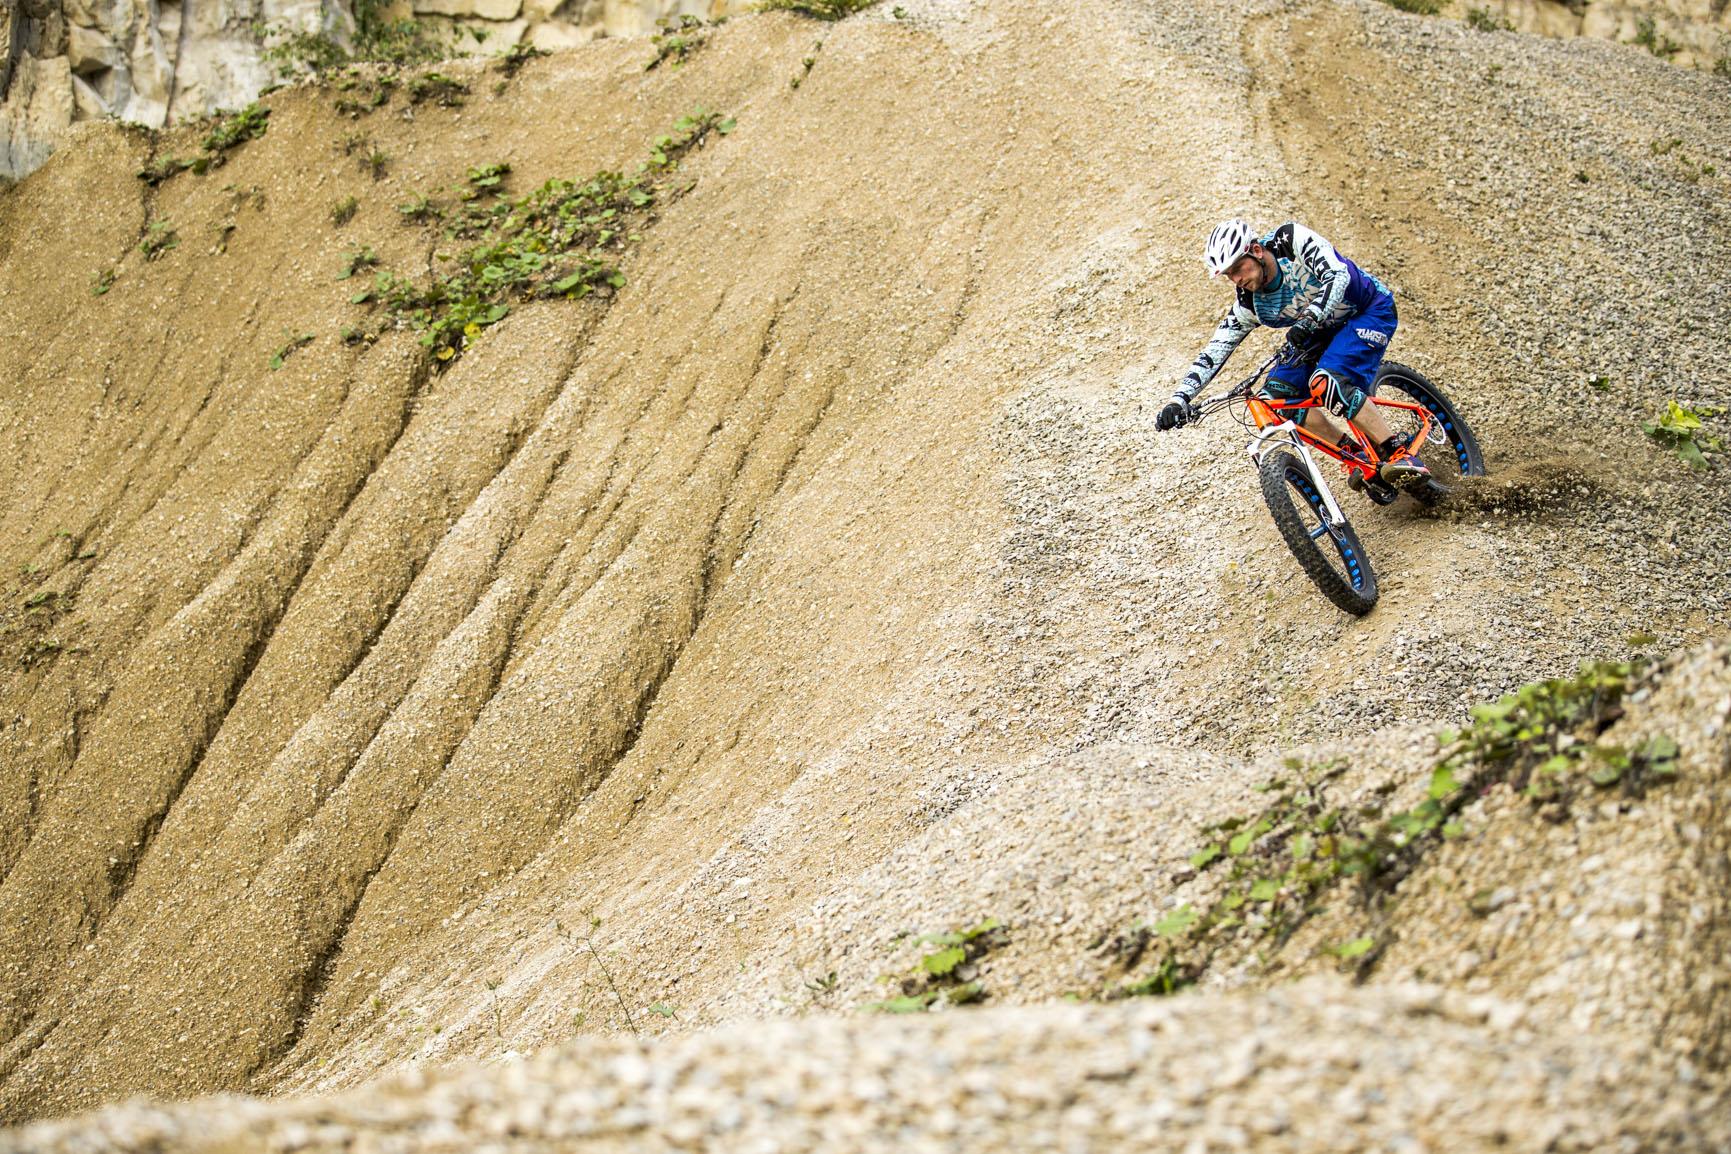 Nicolai FatBike_Schneidi_riding ridge